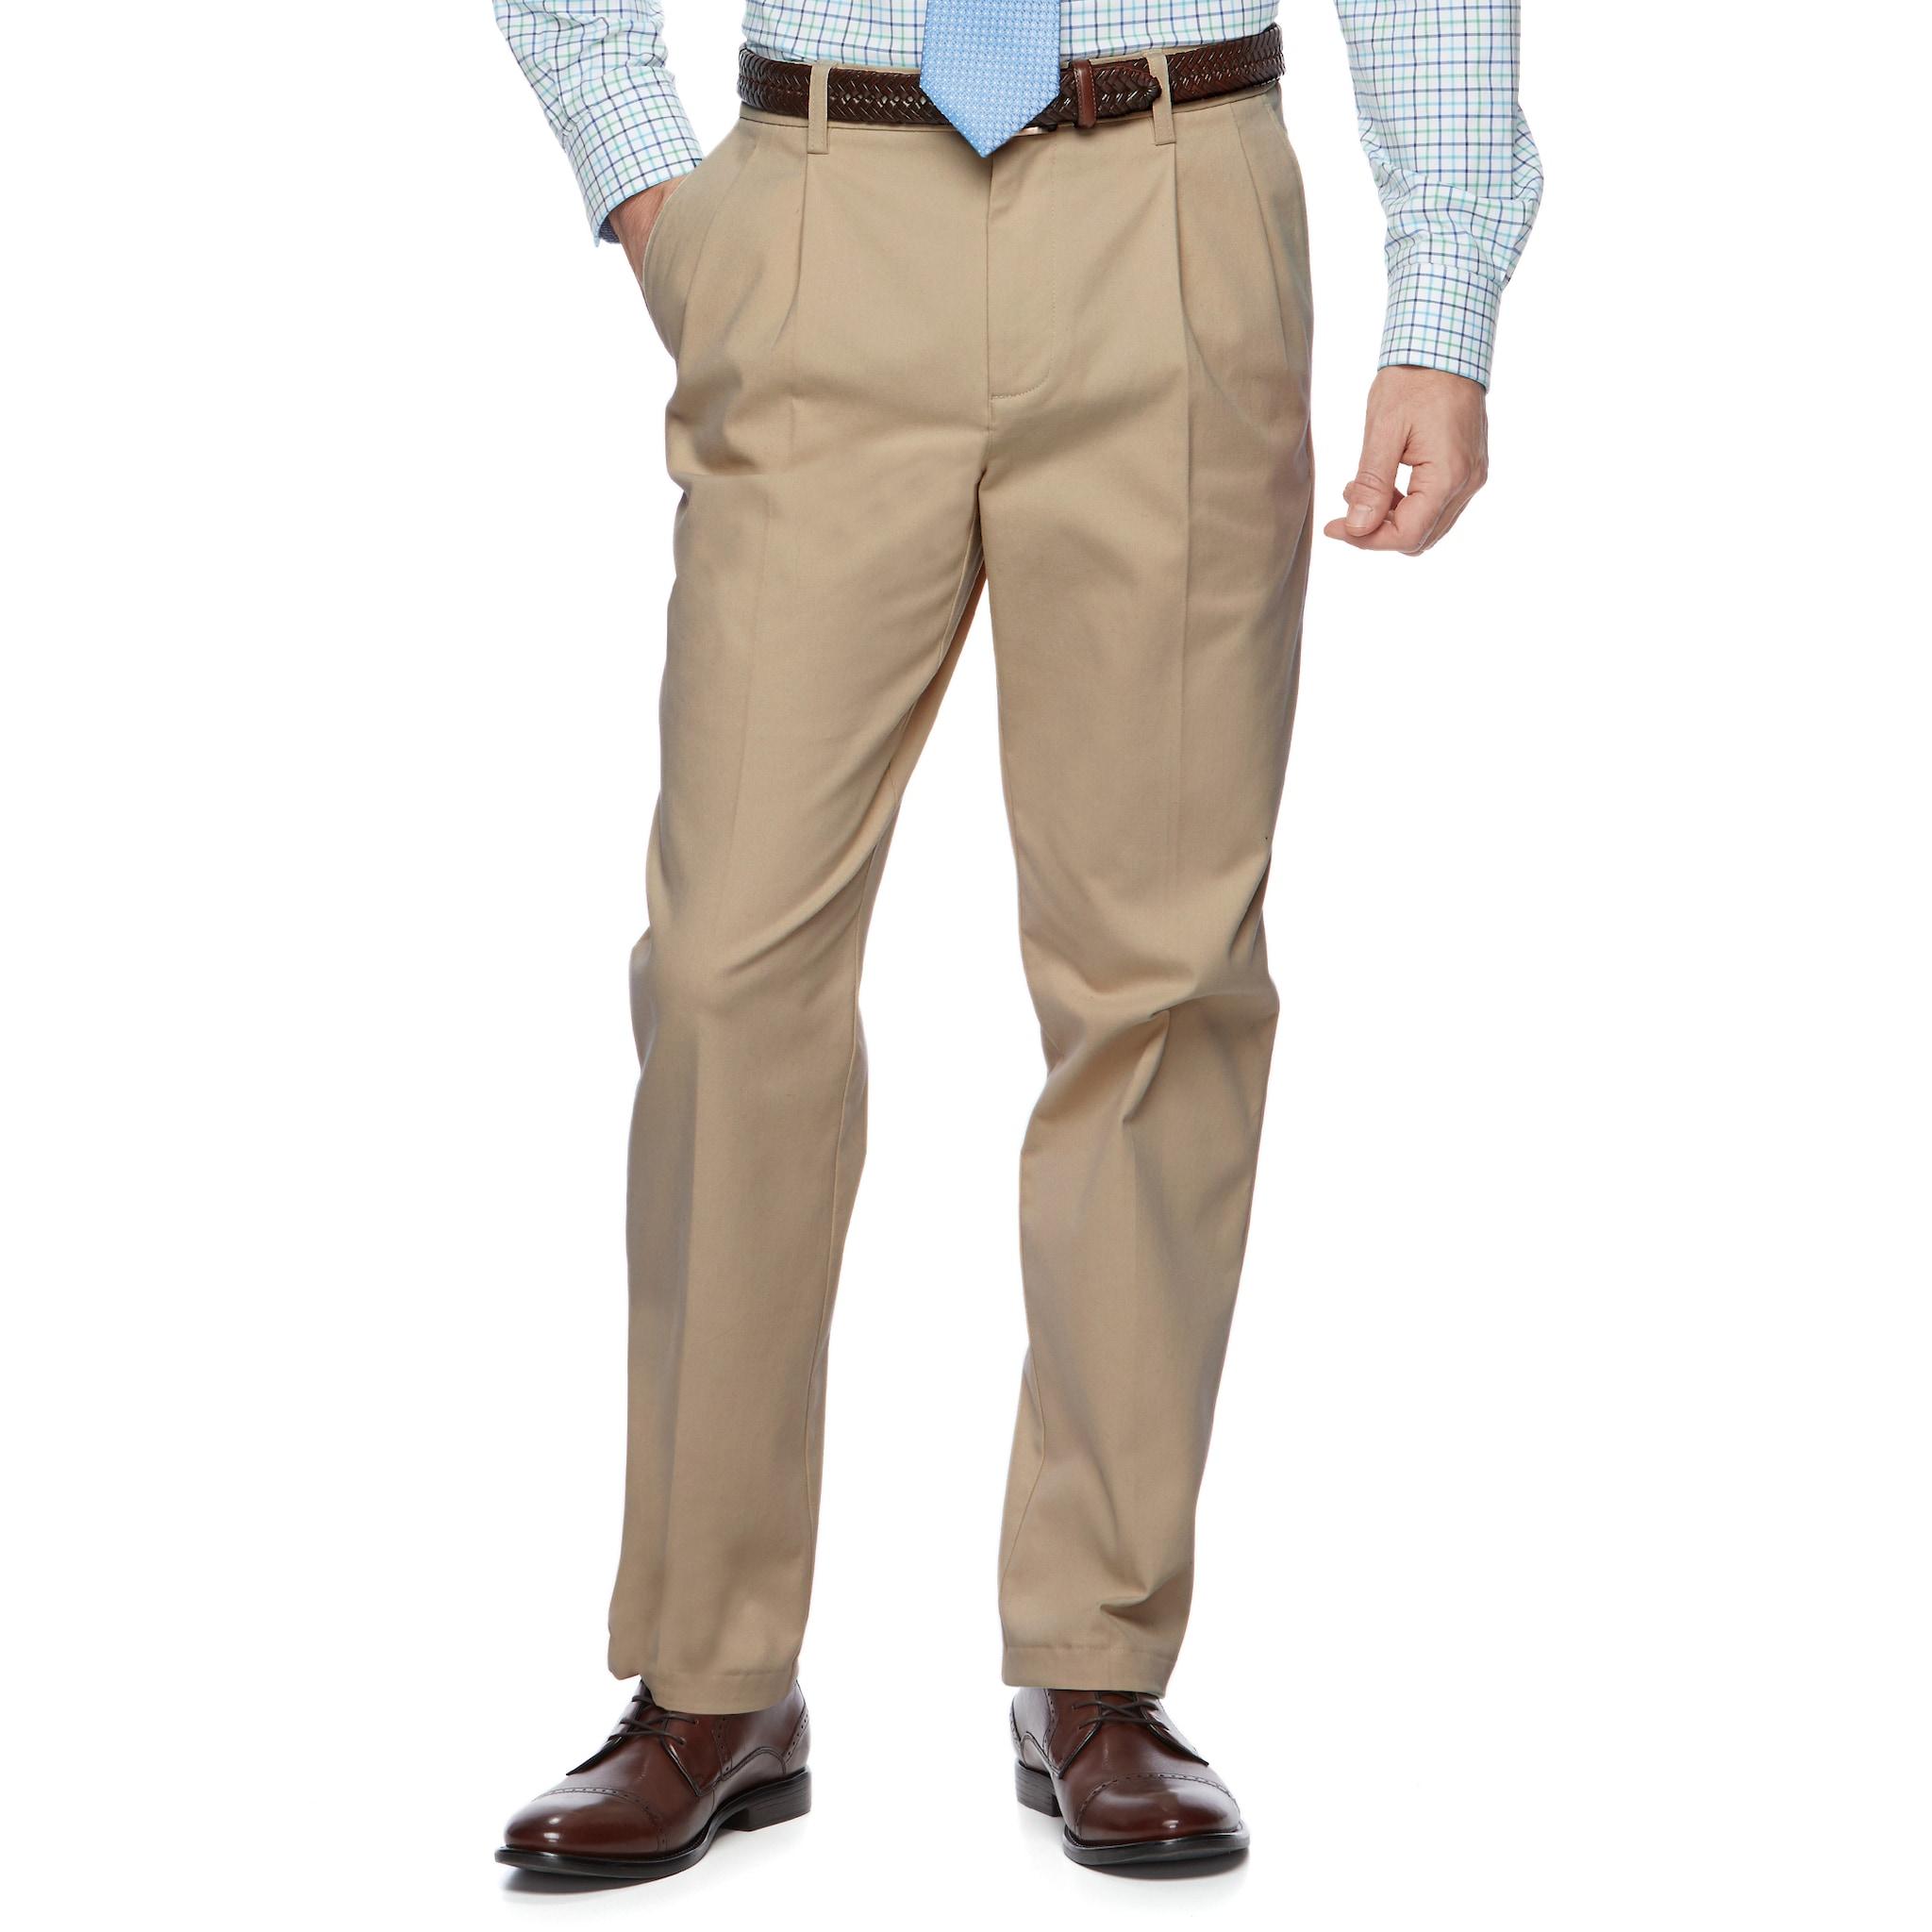 2c3324ae386 Dockers Men's Khaki Pants (Various Styles & Sizes) - Slickdeals.net